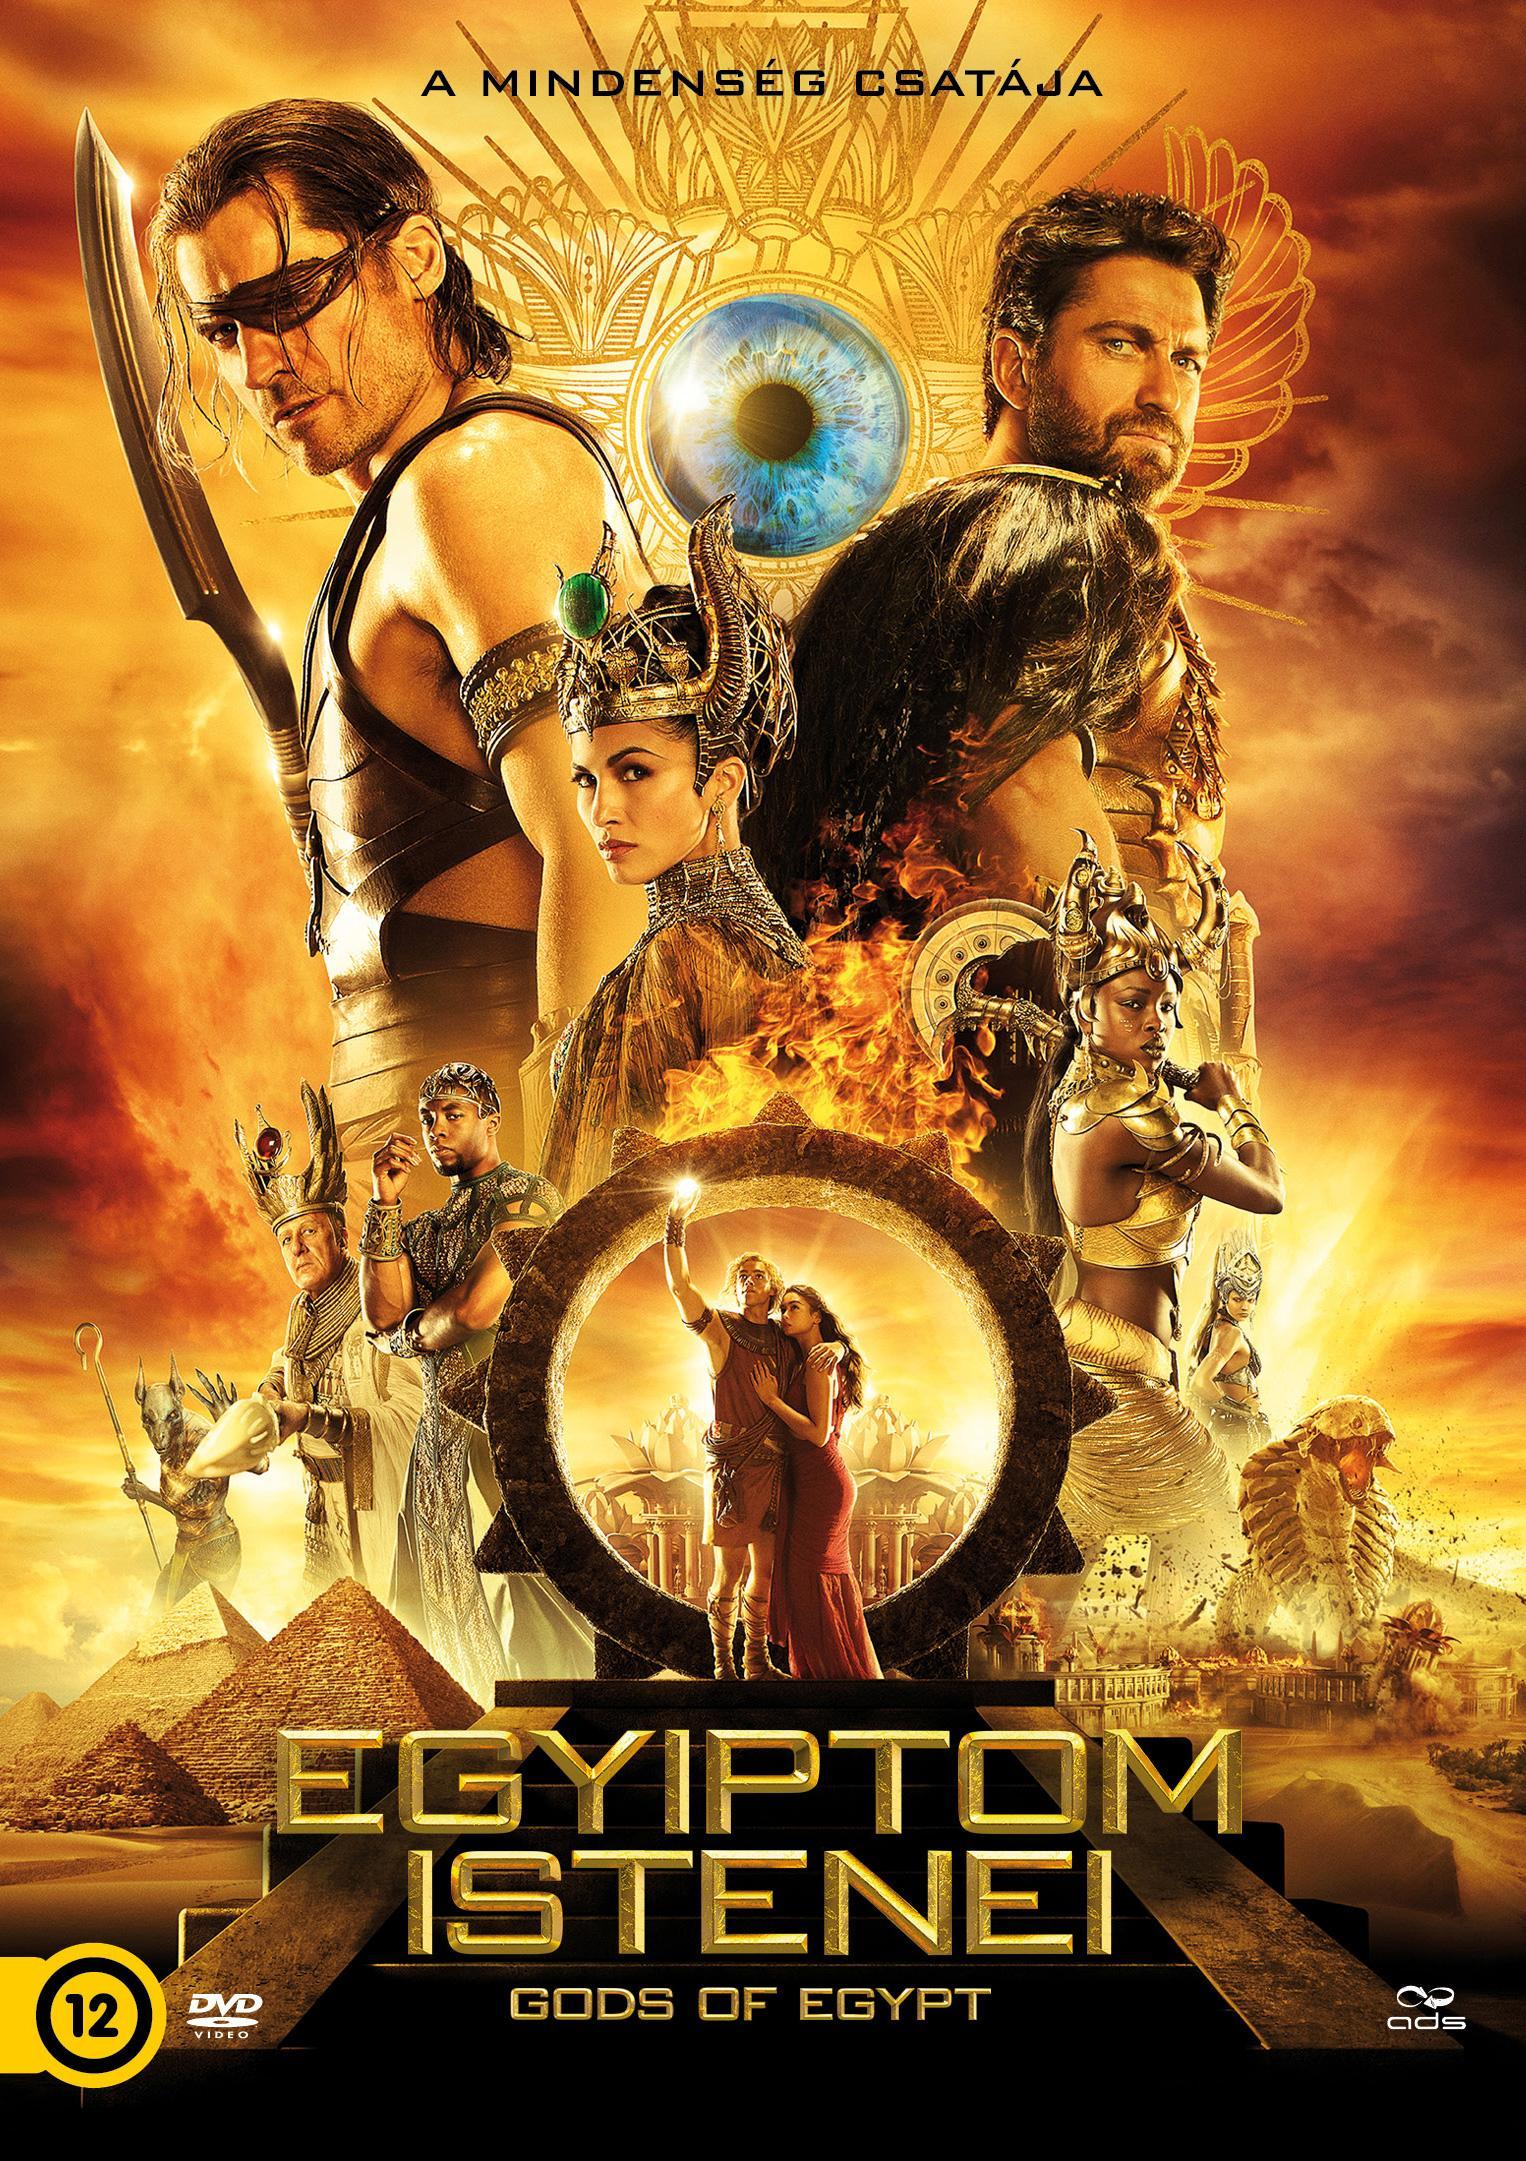 - EGYIPTOM ISTENEI - DVD -